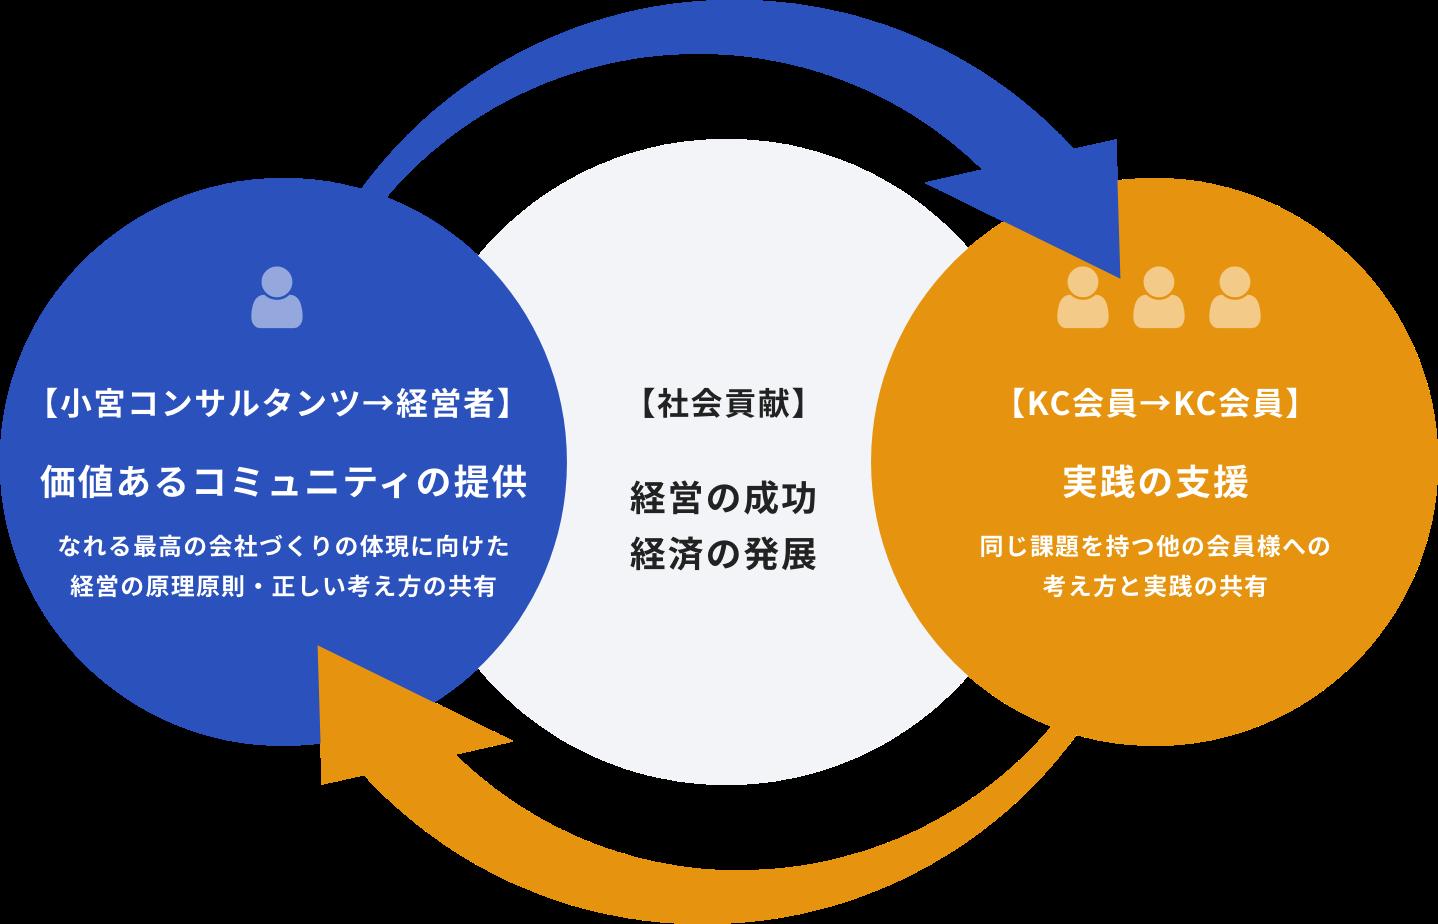 KCの生態系の図